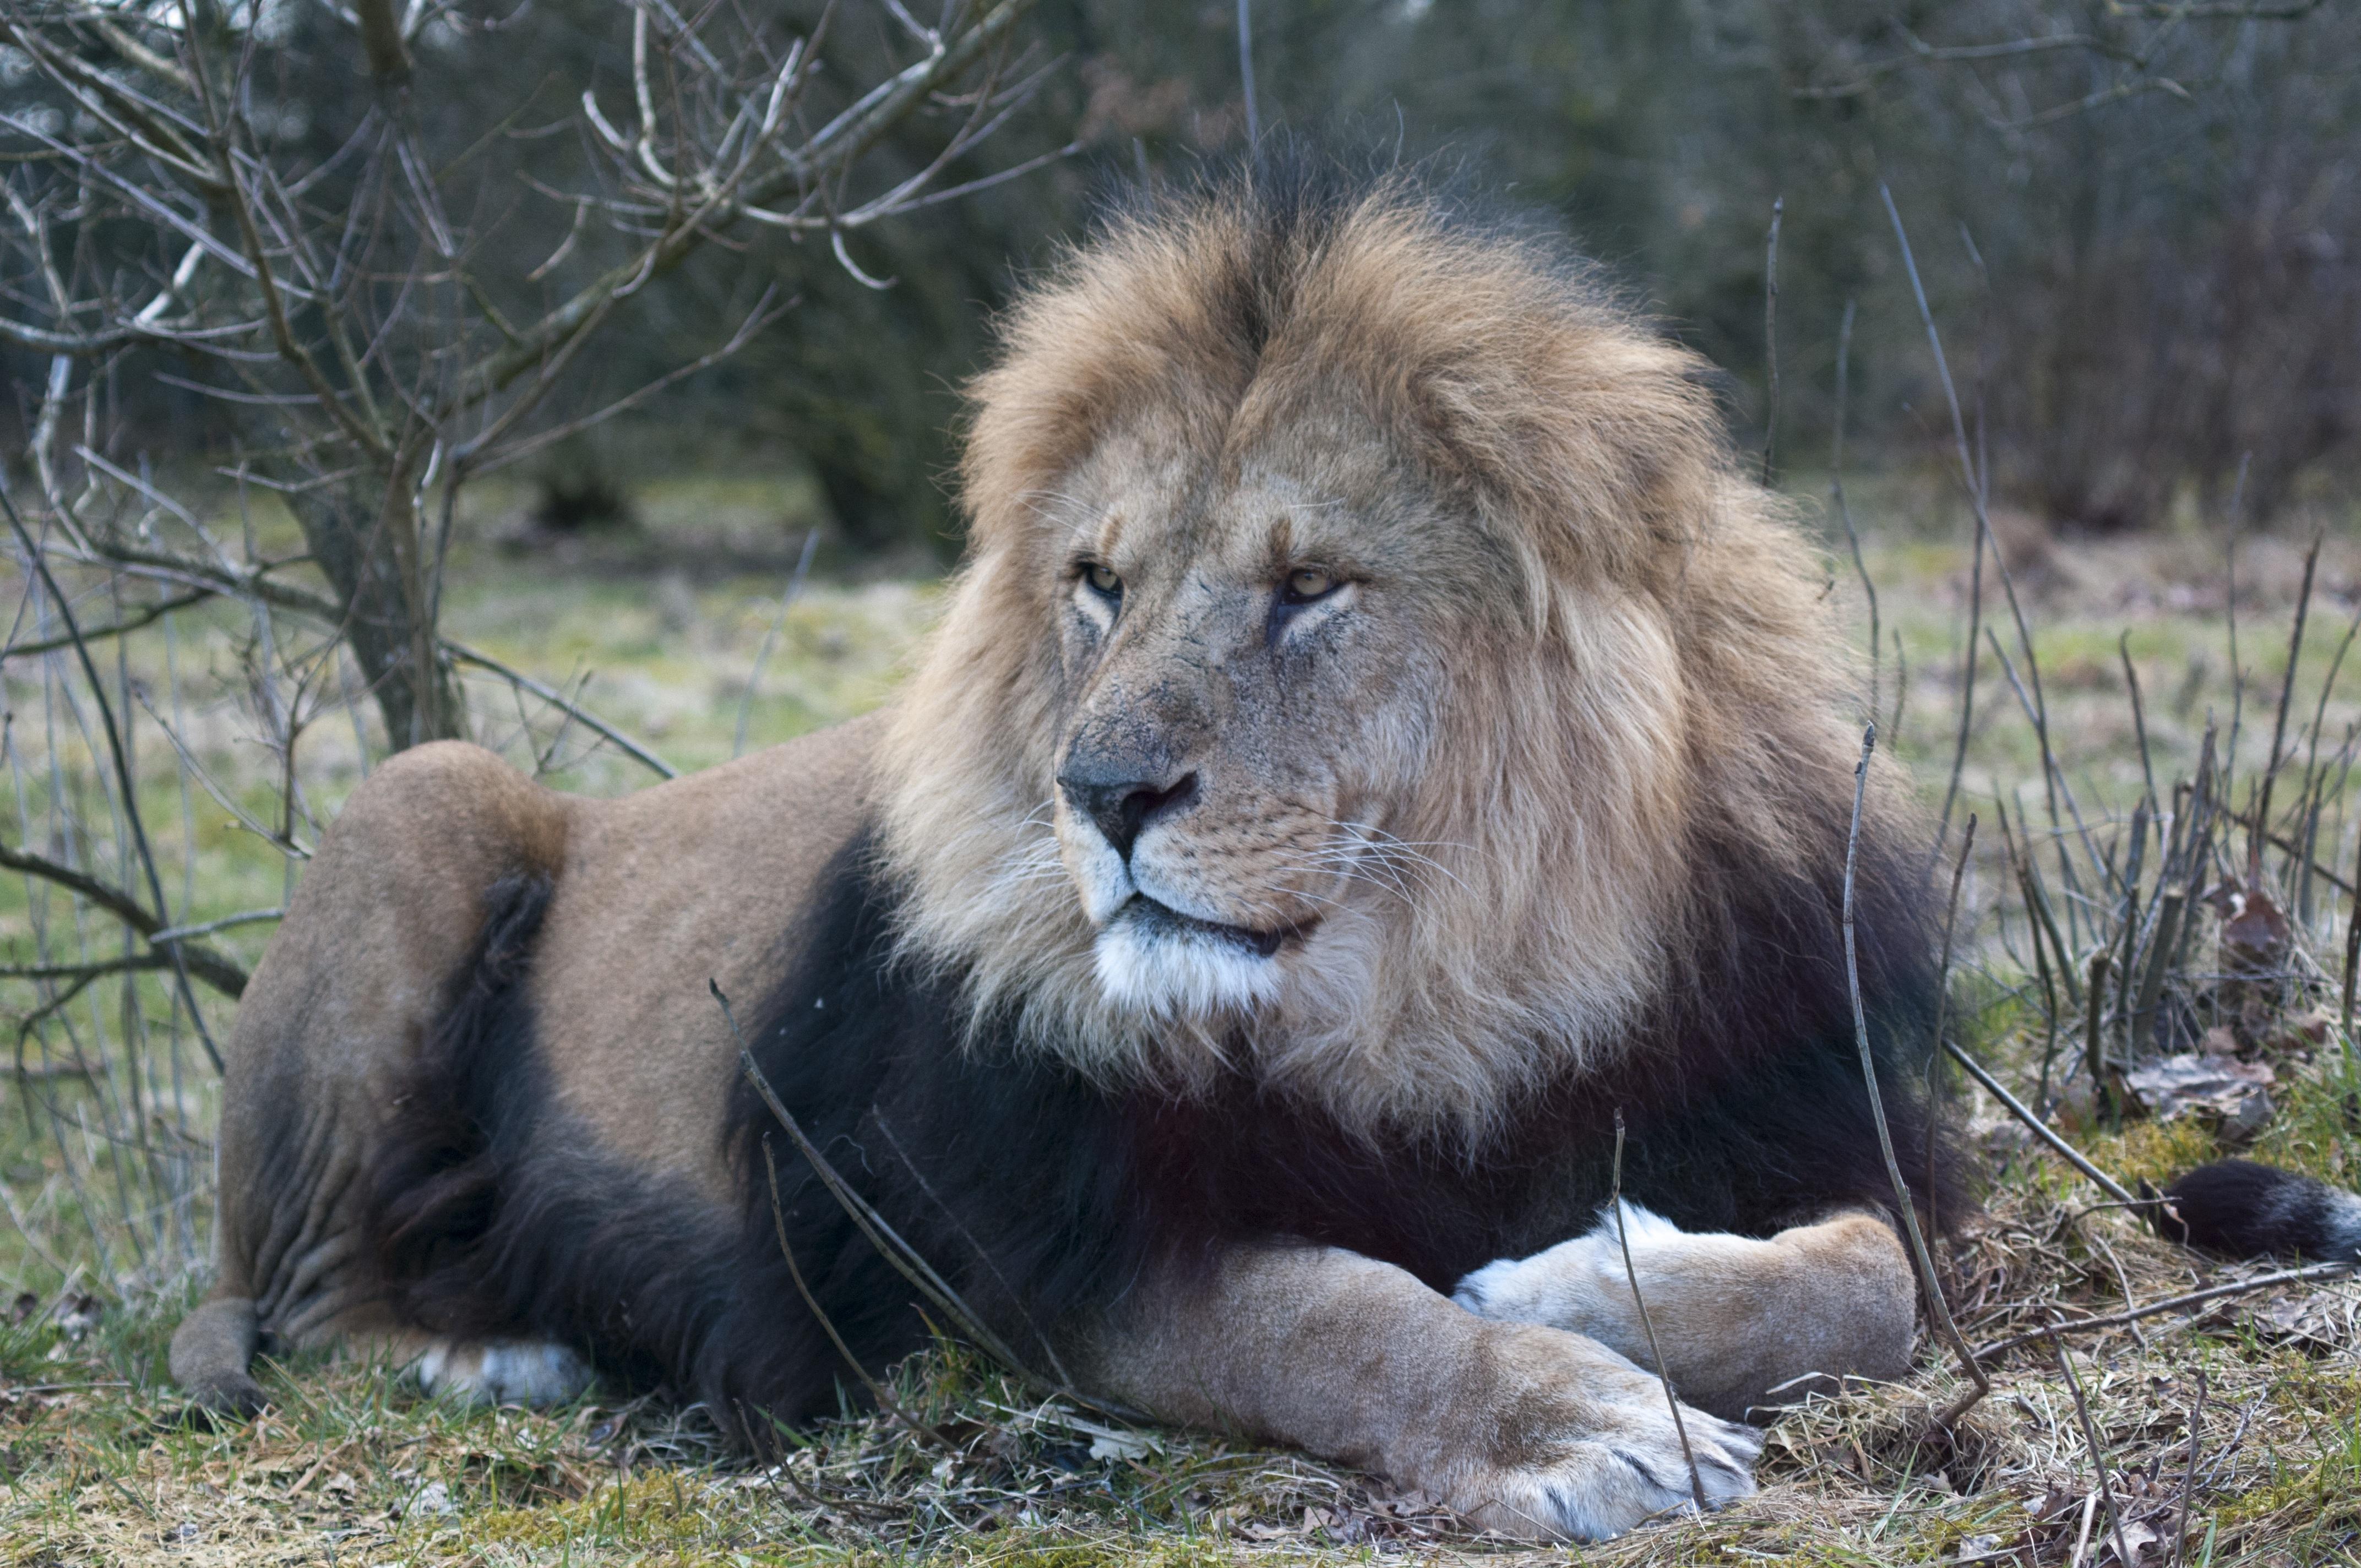 Free adventure wildlife zoo mane fauna vertebrate